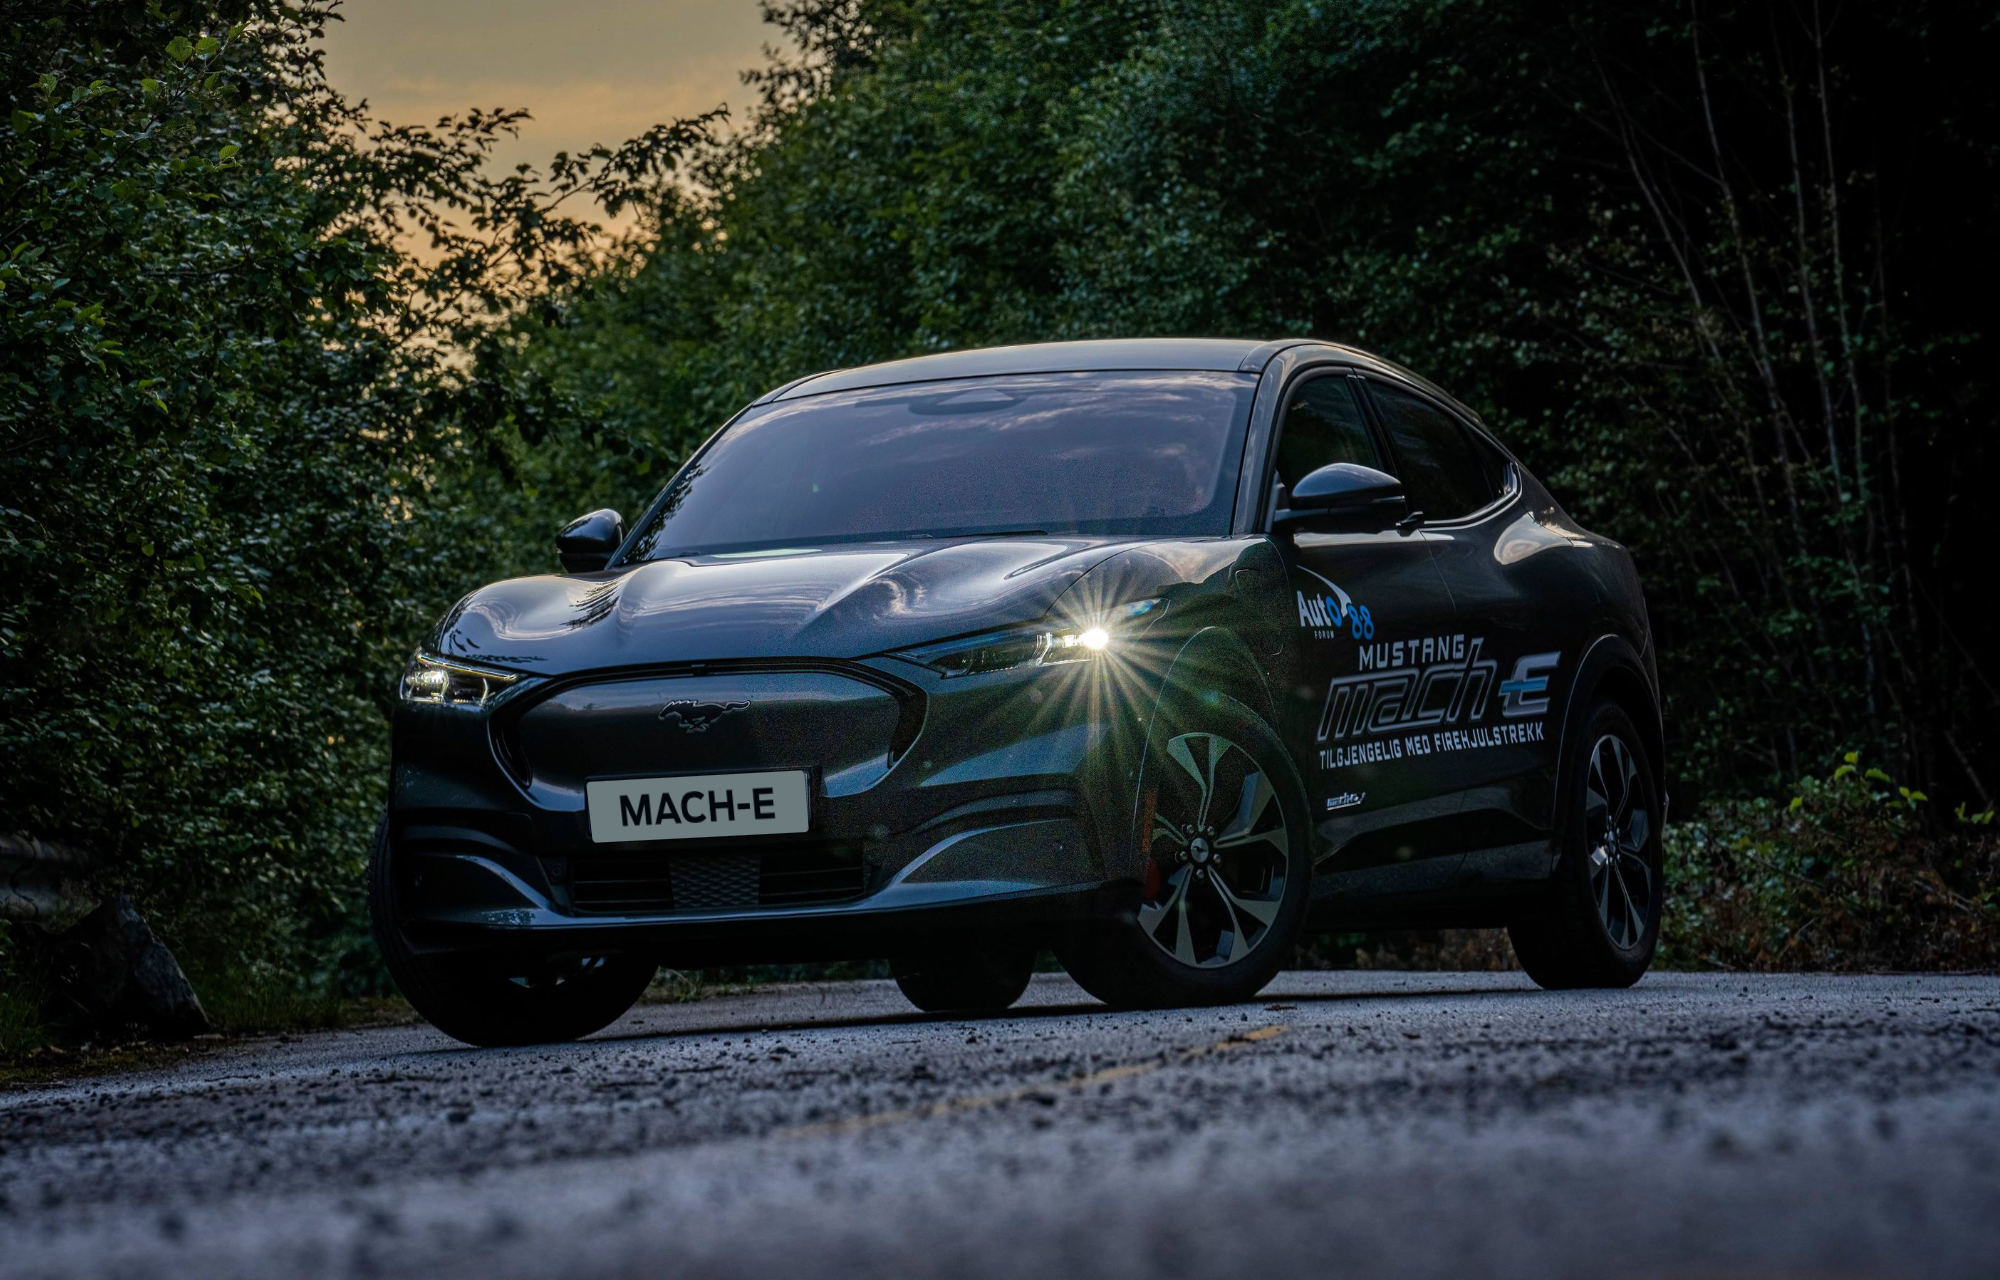 Mustang Mach-E i mørket